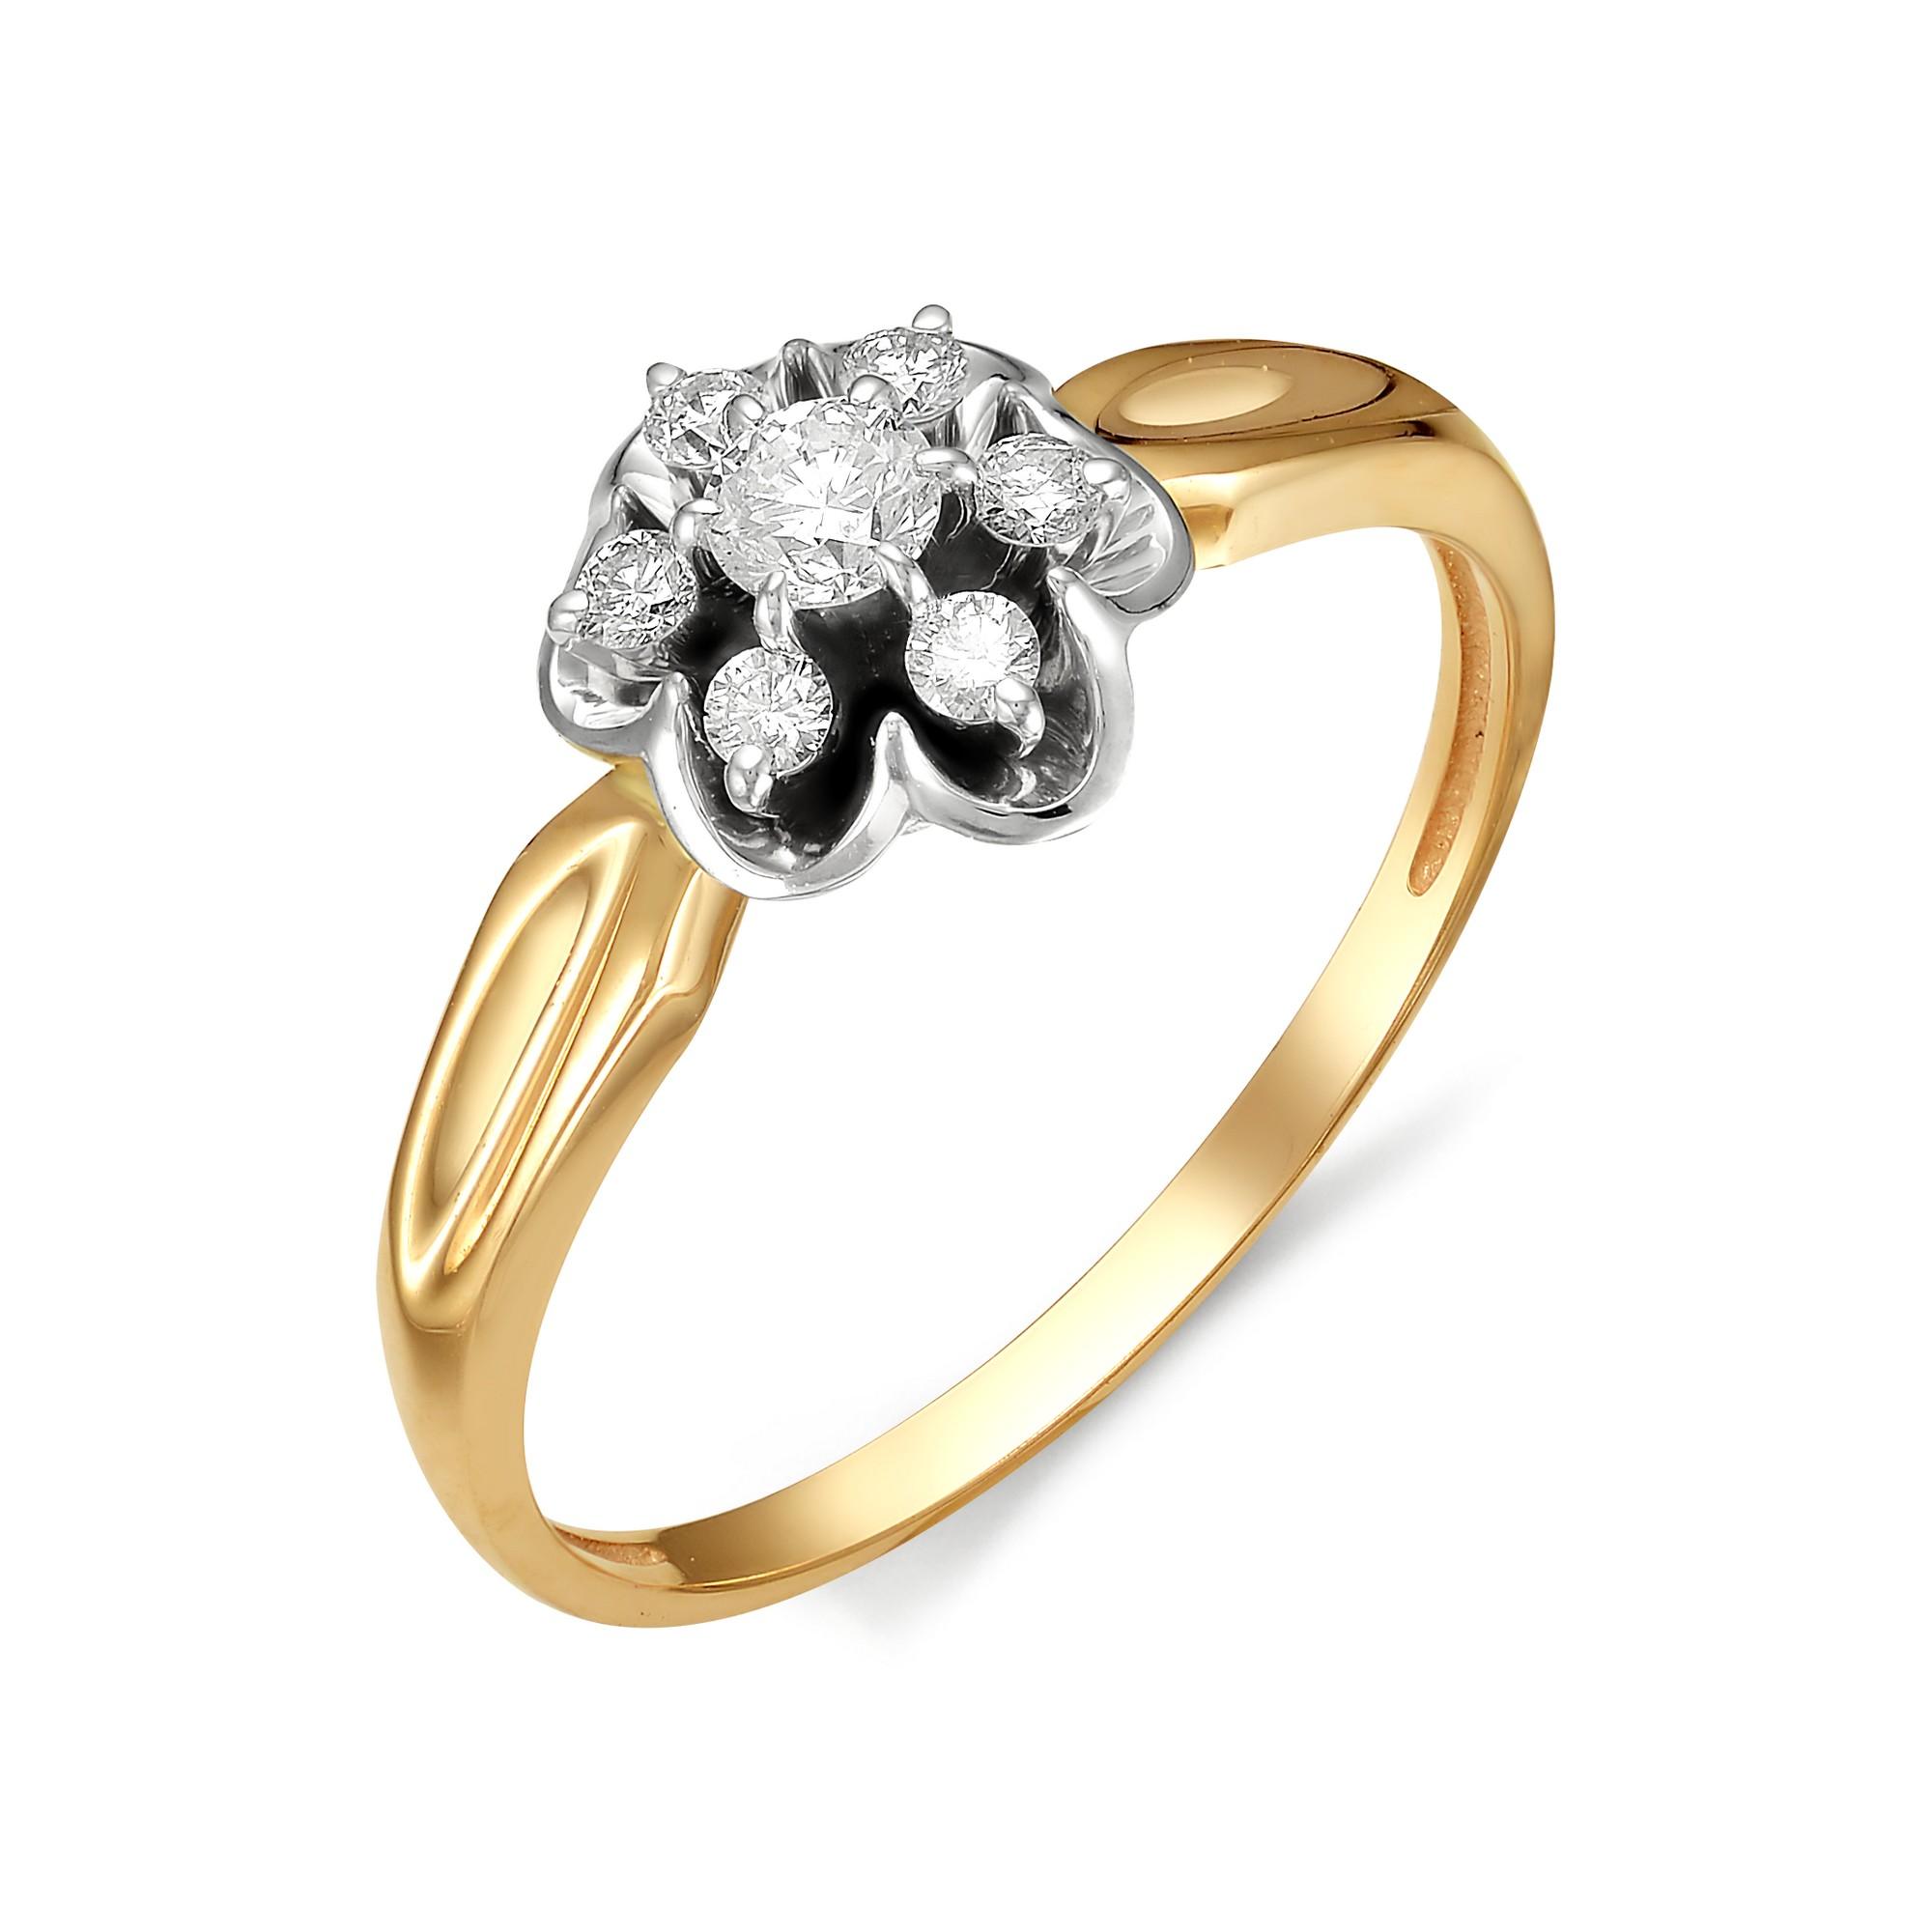 картинка кольцо 11854-100 1 бриллиант круг 57 0,117 7-10 4/6а, 6 бриллиант круг 57 0,110 40-60 4/5а 11854-100